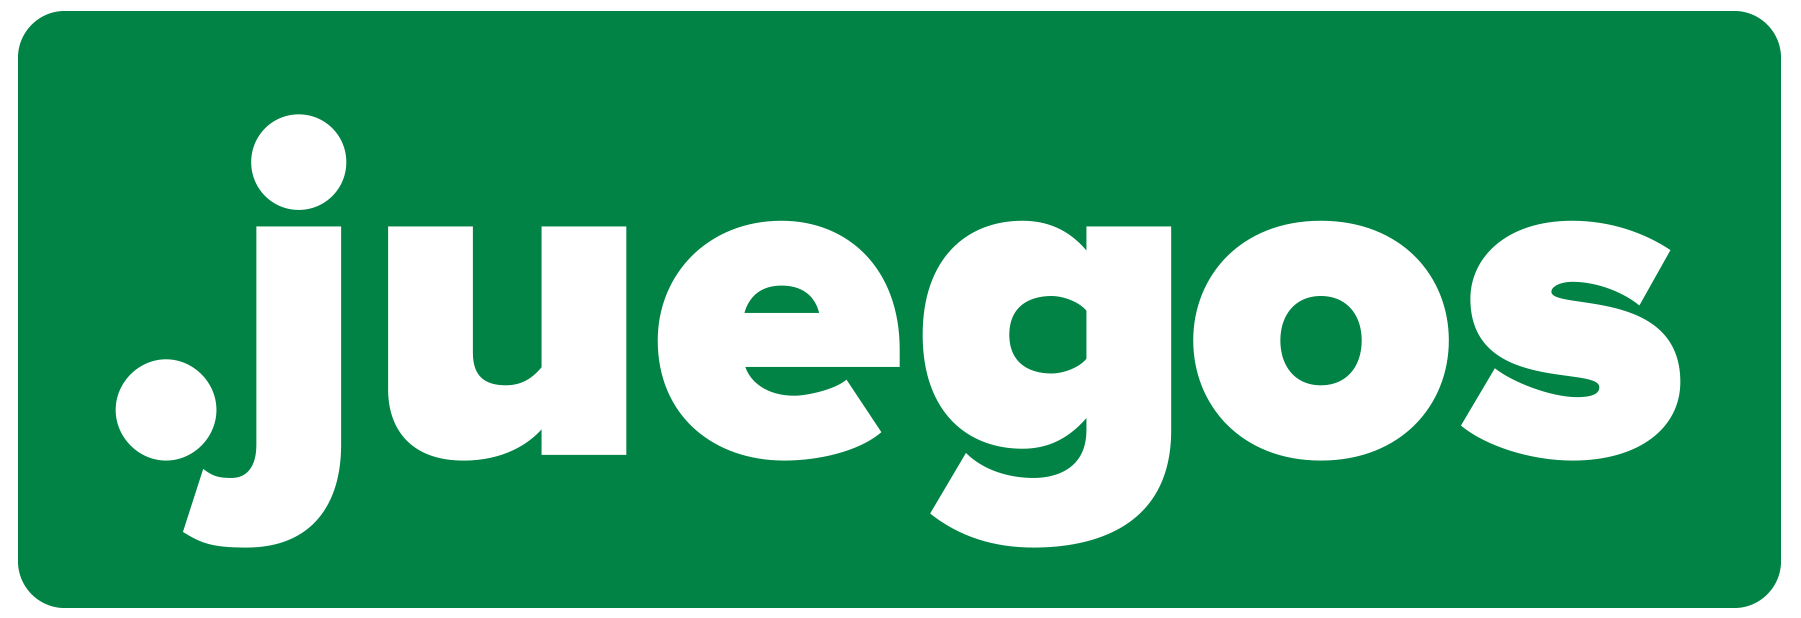 .JUEGOS TLD logo